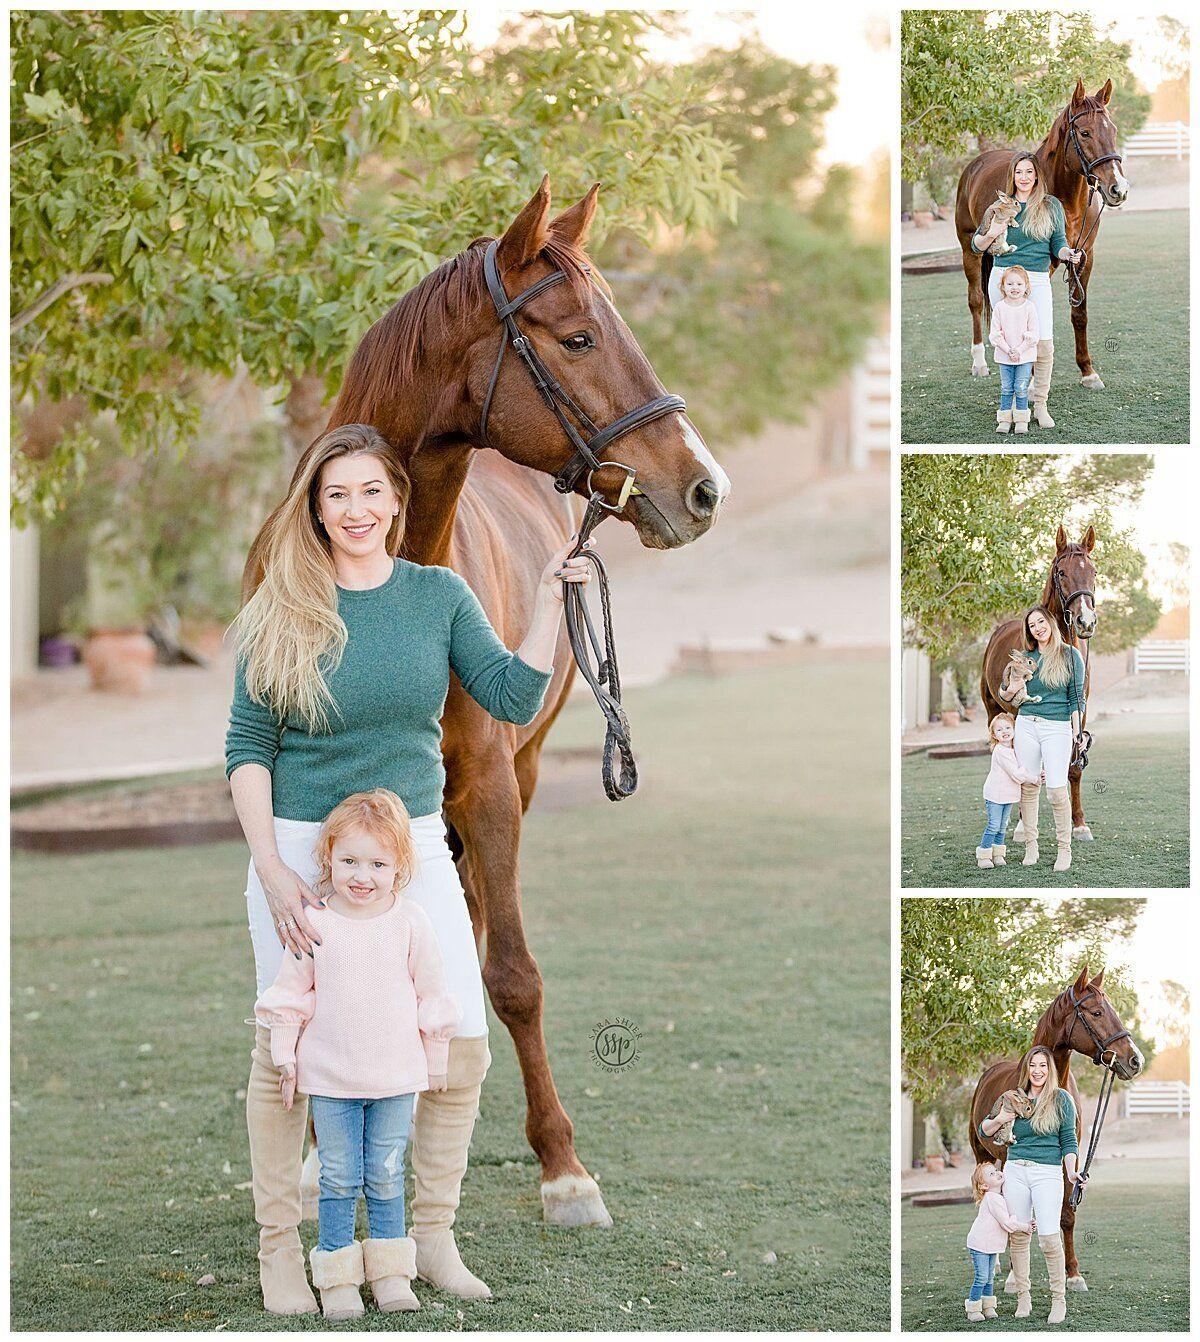 Jamie, Madden + Crew | Hunter's Edge | Las Vegas, NV | Horse photos, Equine photographer, Las vegas